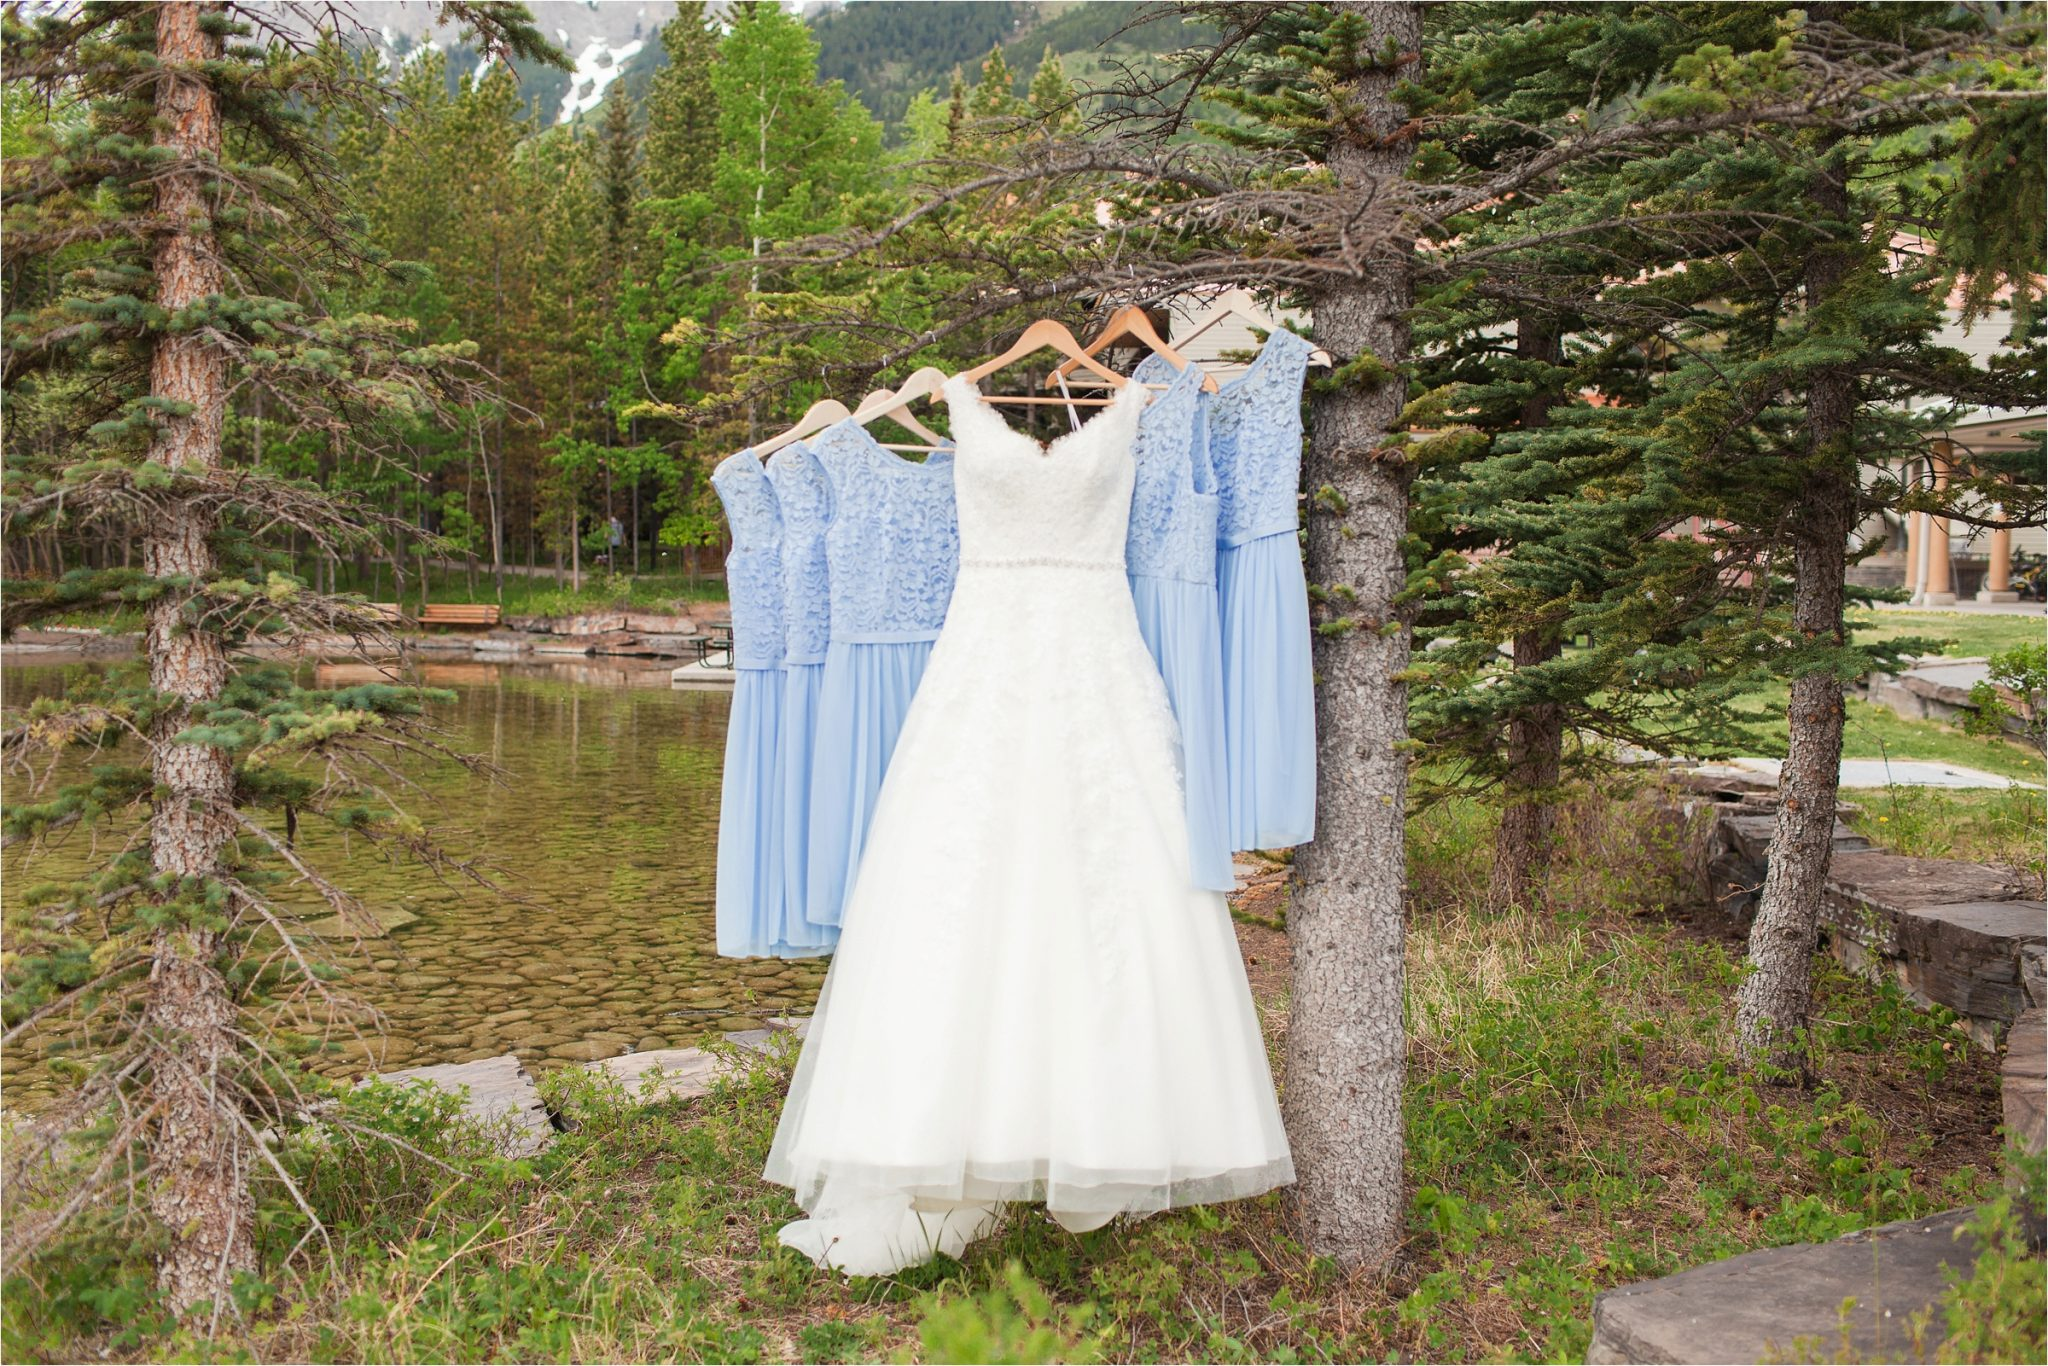 Kananaskis Canada Wedding at the Delta Lodge-Kaitlin & Ricky-Alabama wedding photographer-Lodge wedding-Wedding dress-Bridesmaids dresses-Baby blue bridesmaids dresses